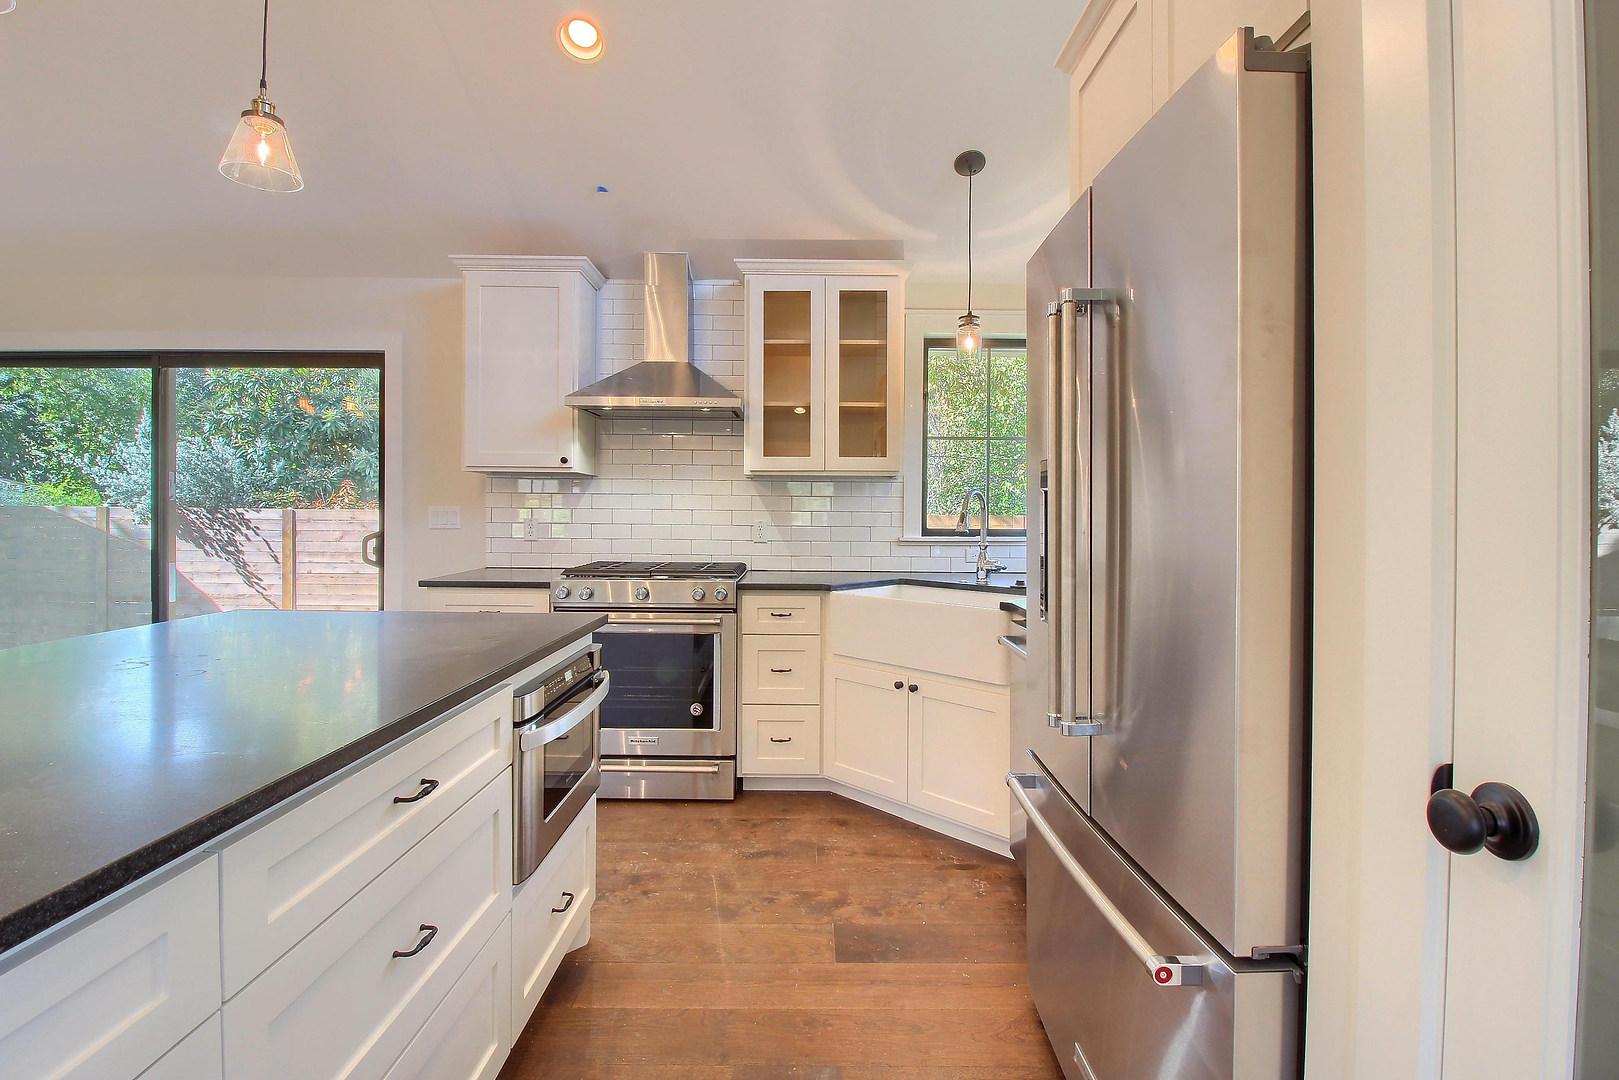 Home Renovation Kitchen Appliances on Bouldin in Austin, TX